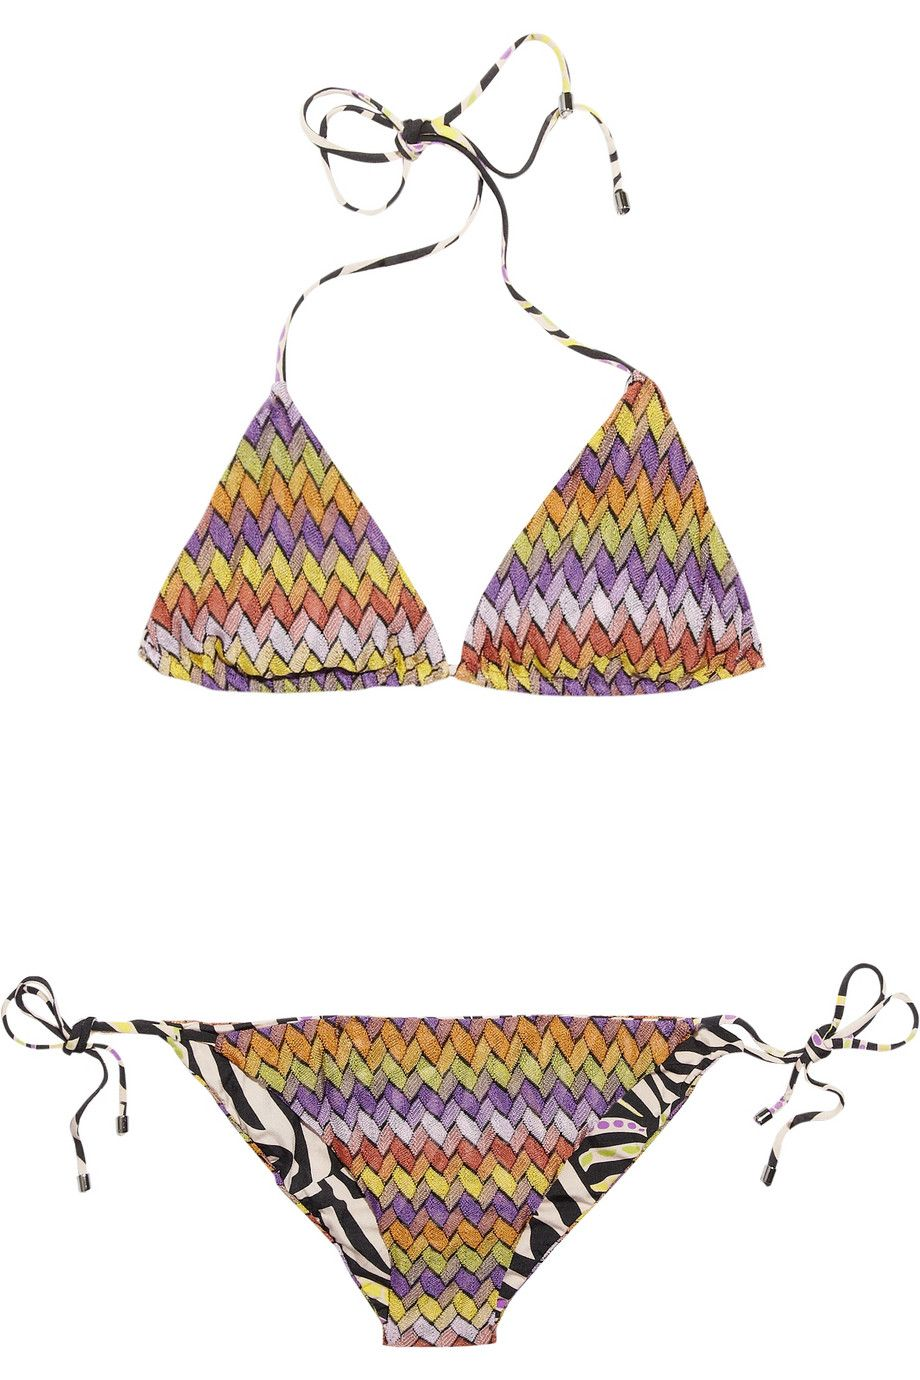 5111fdb3240fe Missoni | Basket reversible triangle bikini | NET-A-PORTER.COM ...